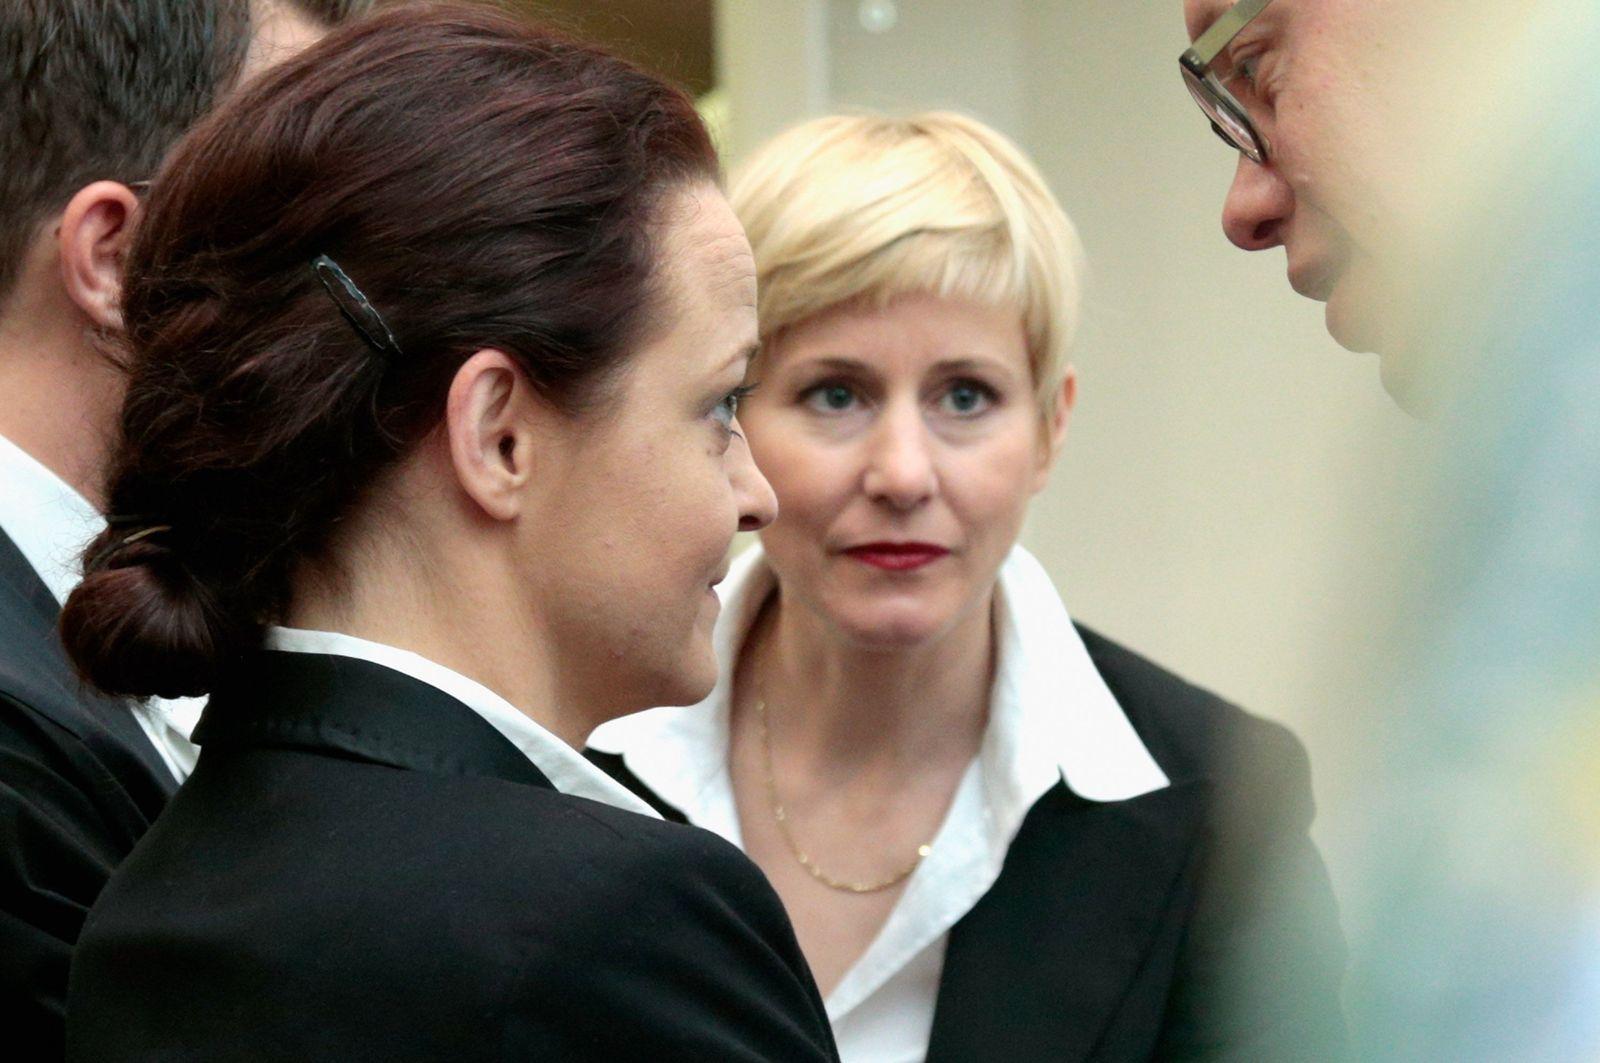 Beate Zschäpe Anja Sturm